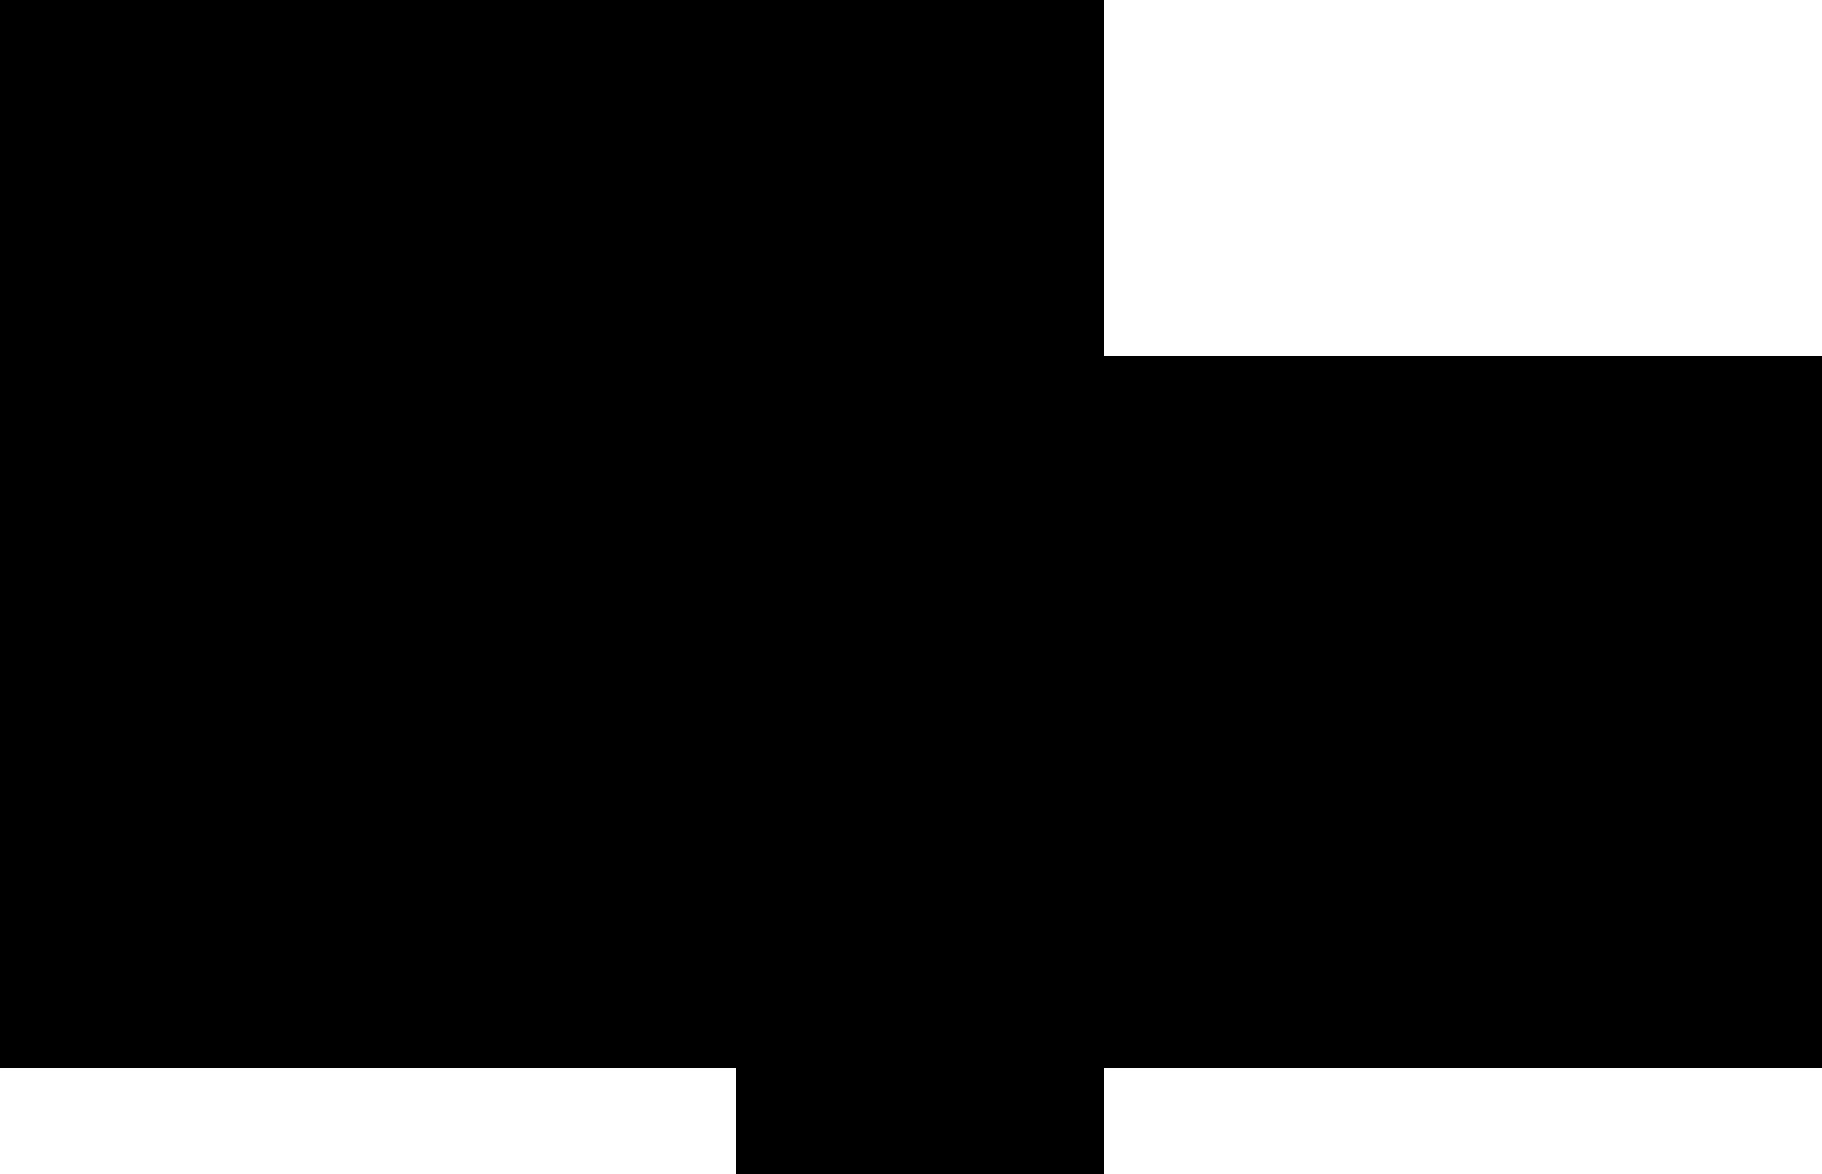 owl logo from Purdue University